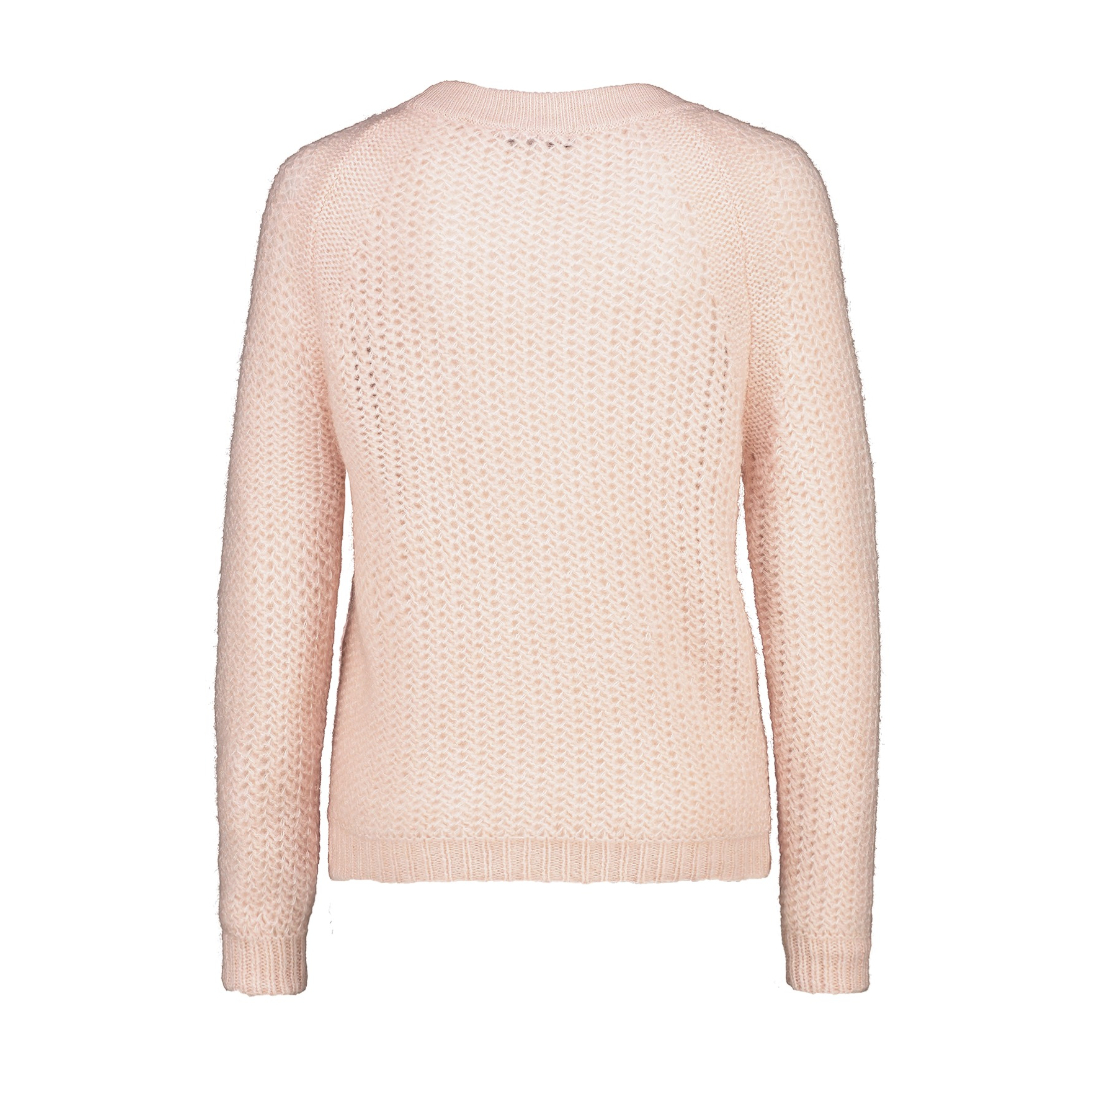 Expresso trui 194paris in het Roze